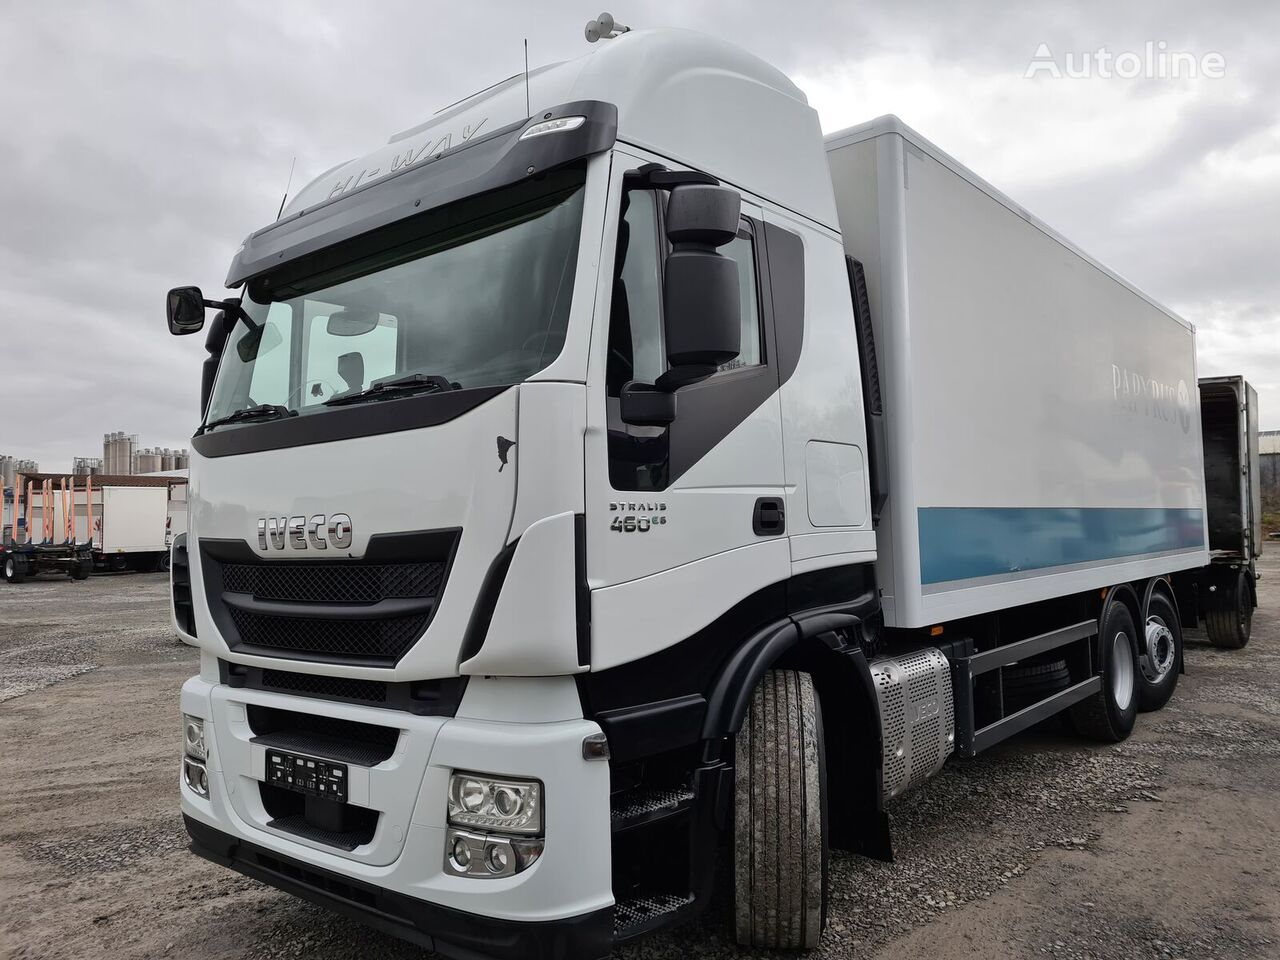 IVECO Stralis 460E6 6x2 Lenkachse Durchlader Stahlboden (43) box truck